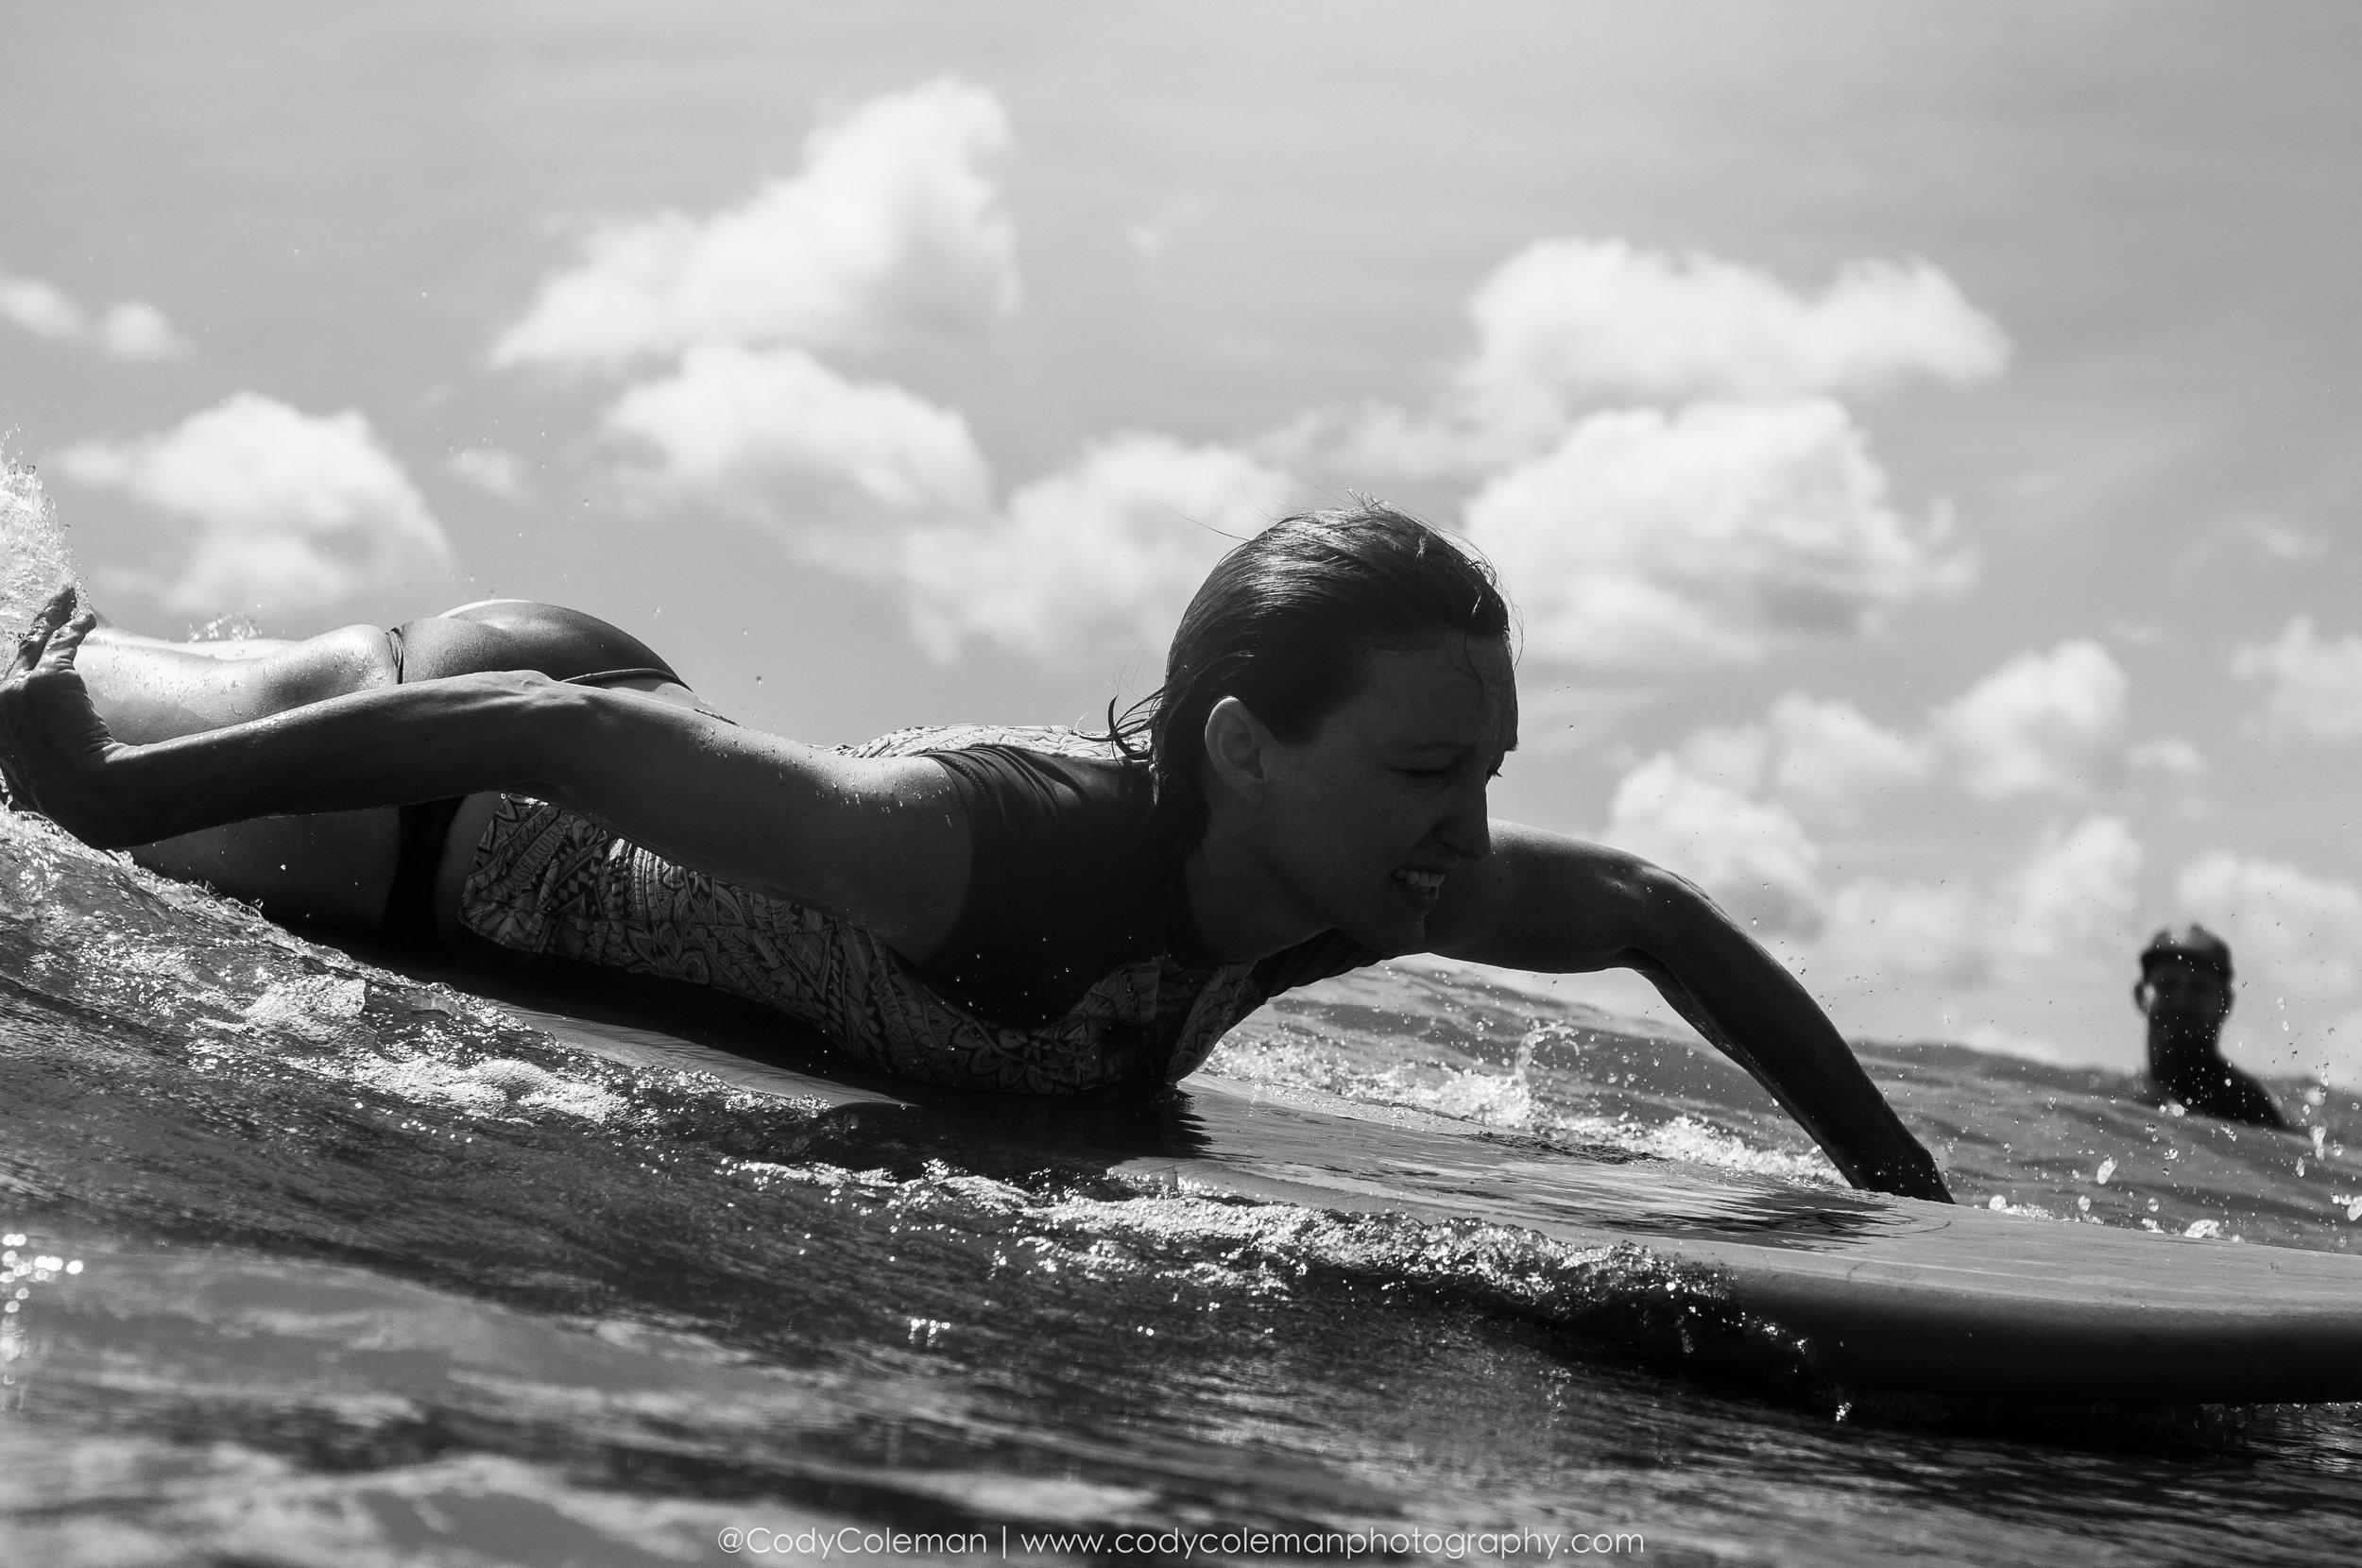 Motherday_SurfCamp_PHOTO_COLEMAN-373.jpg